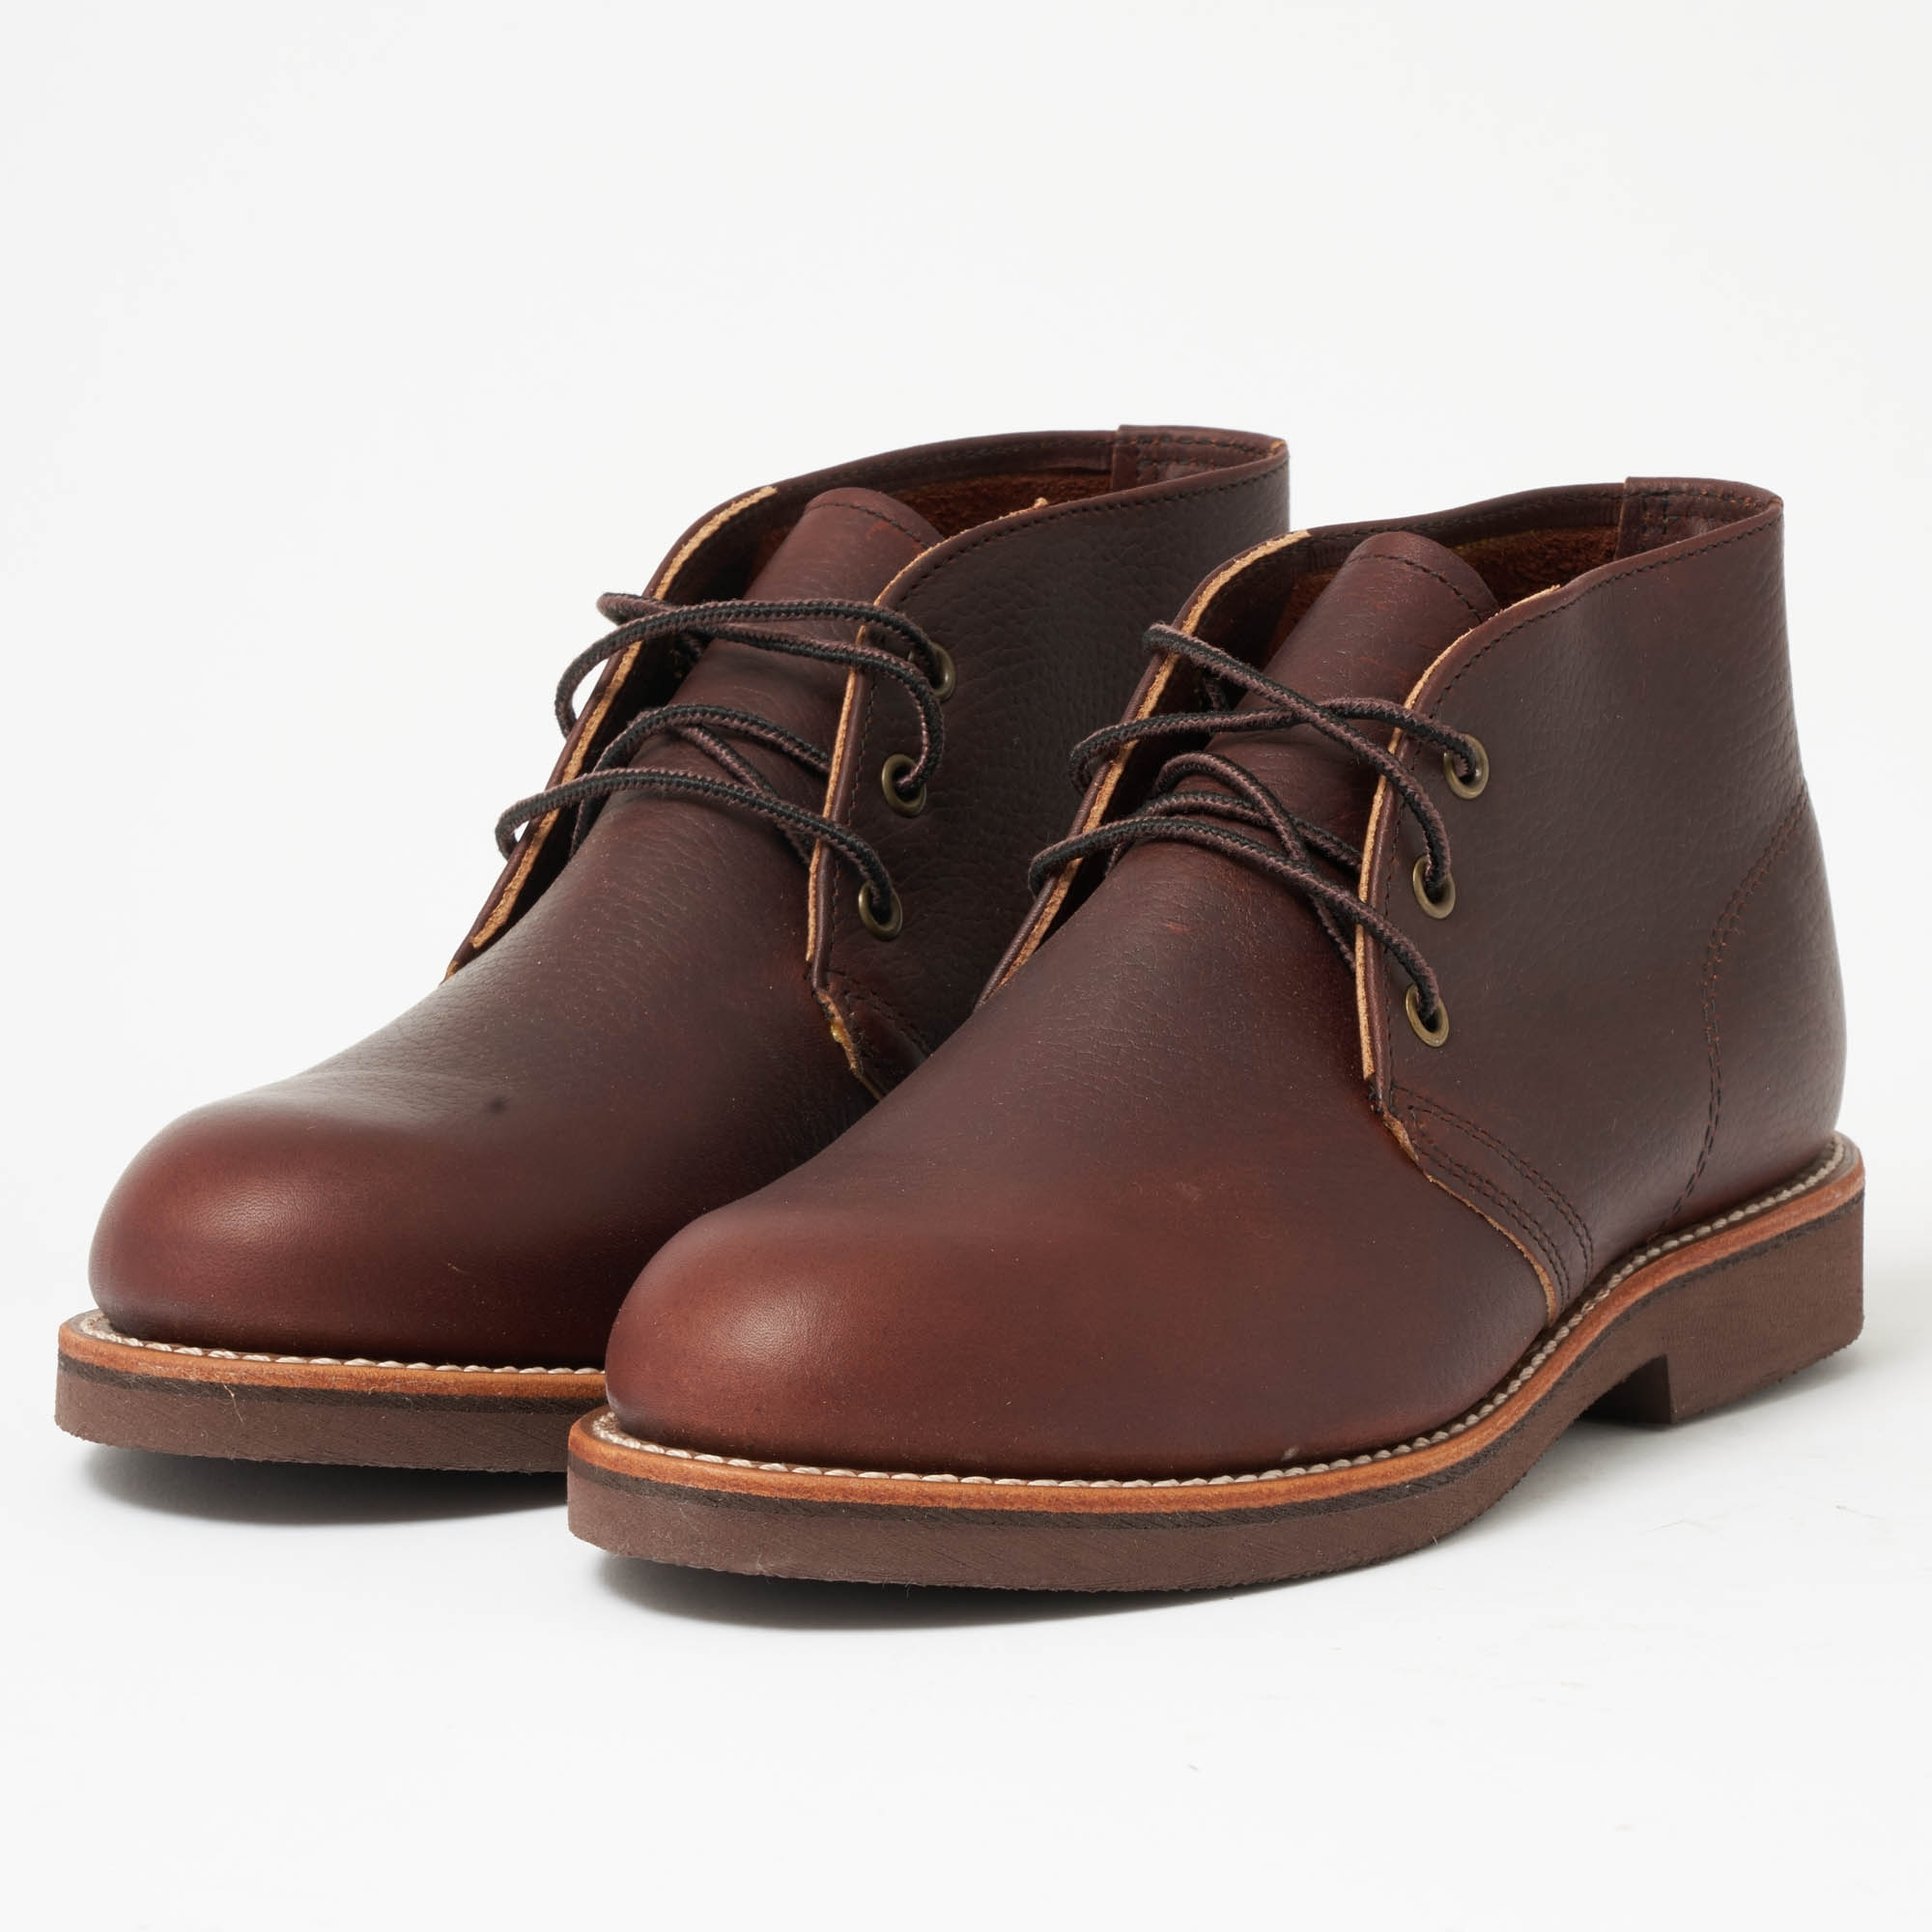 Foreman Chukka Briar Brown Boot